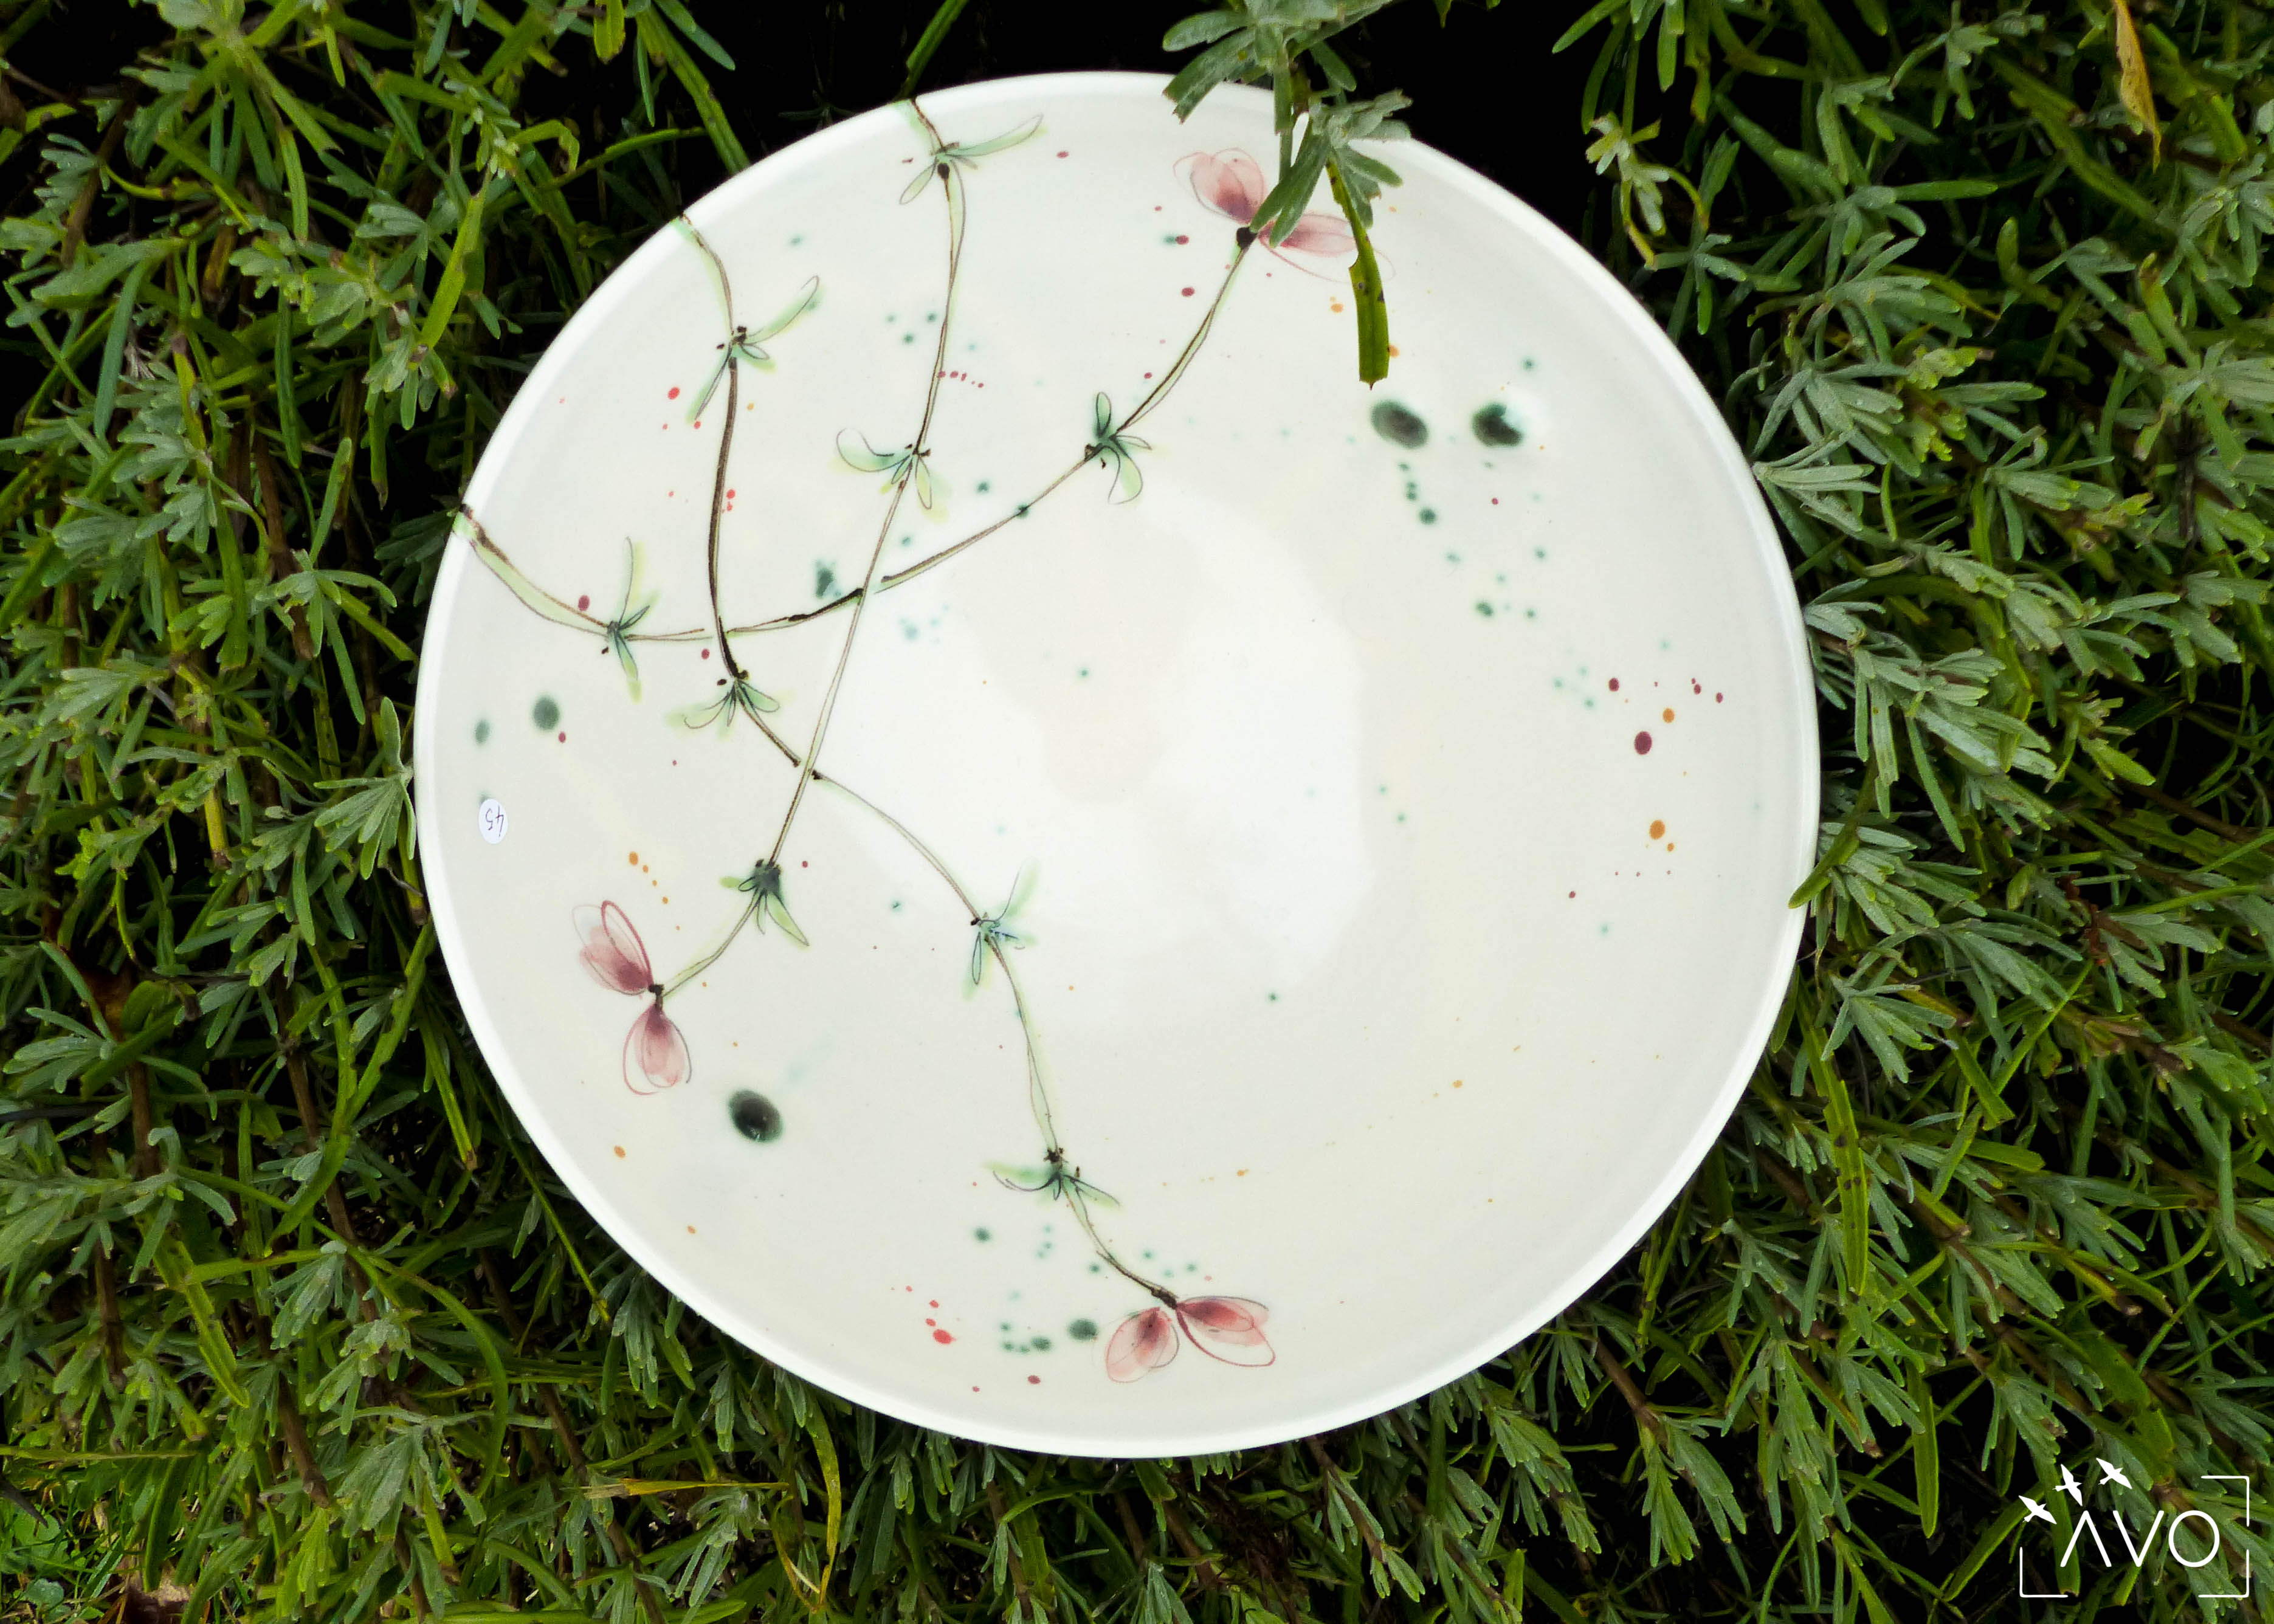 marina-leflon-ceramiste-courzieu-atelier-gres-faience-fleurs-art-de-la-table-atelier-poterie